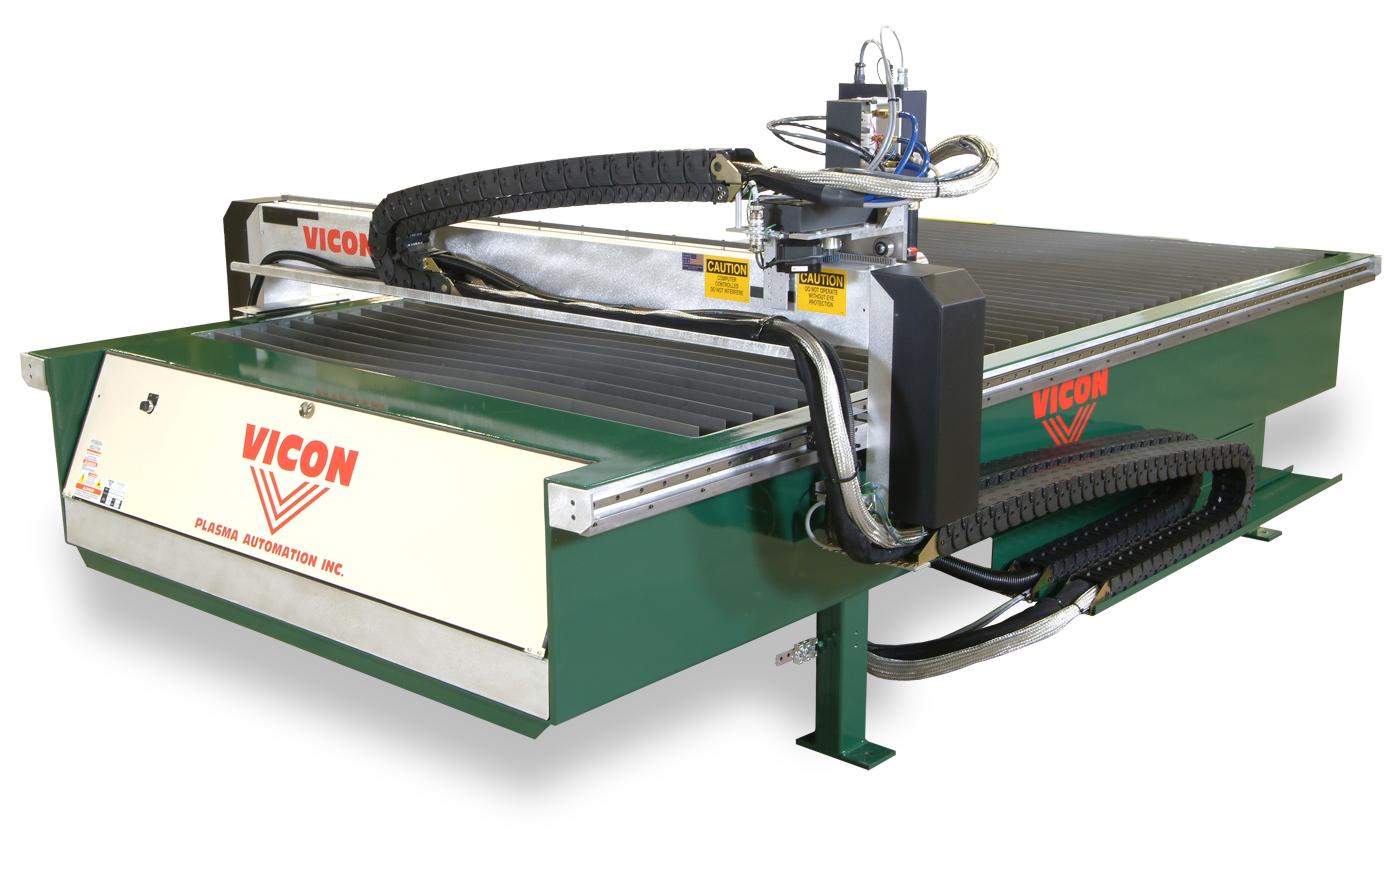 Vicon Fabricator Ss Plasma Cutting System